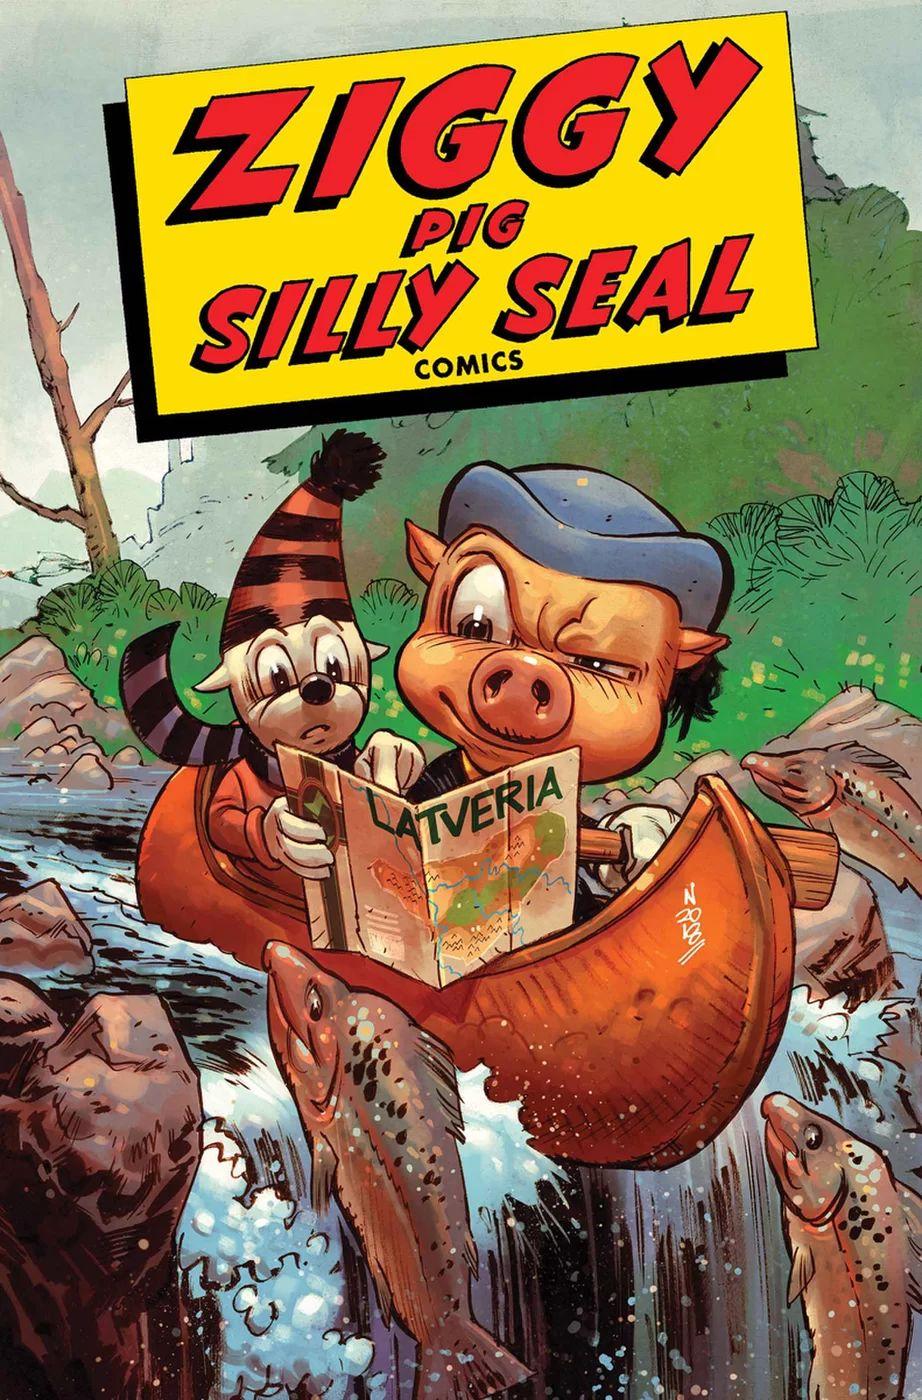 Ziggy Pig - Silly Seal Comics